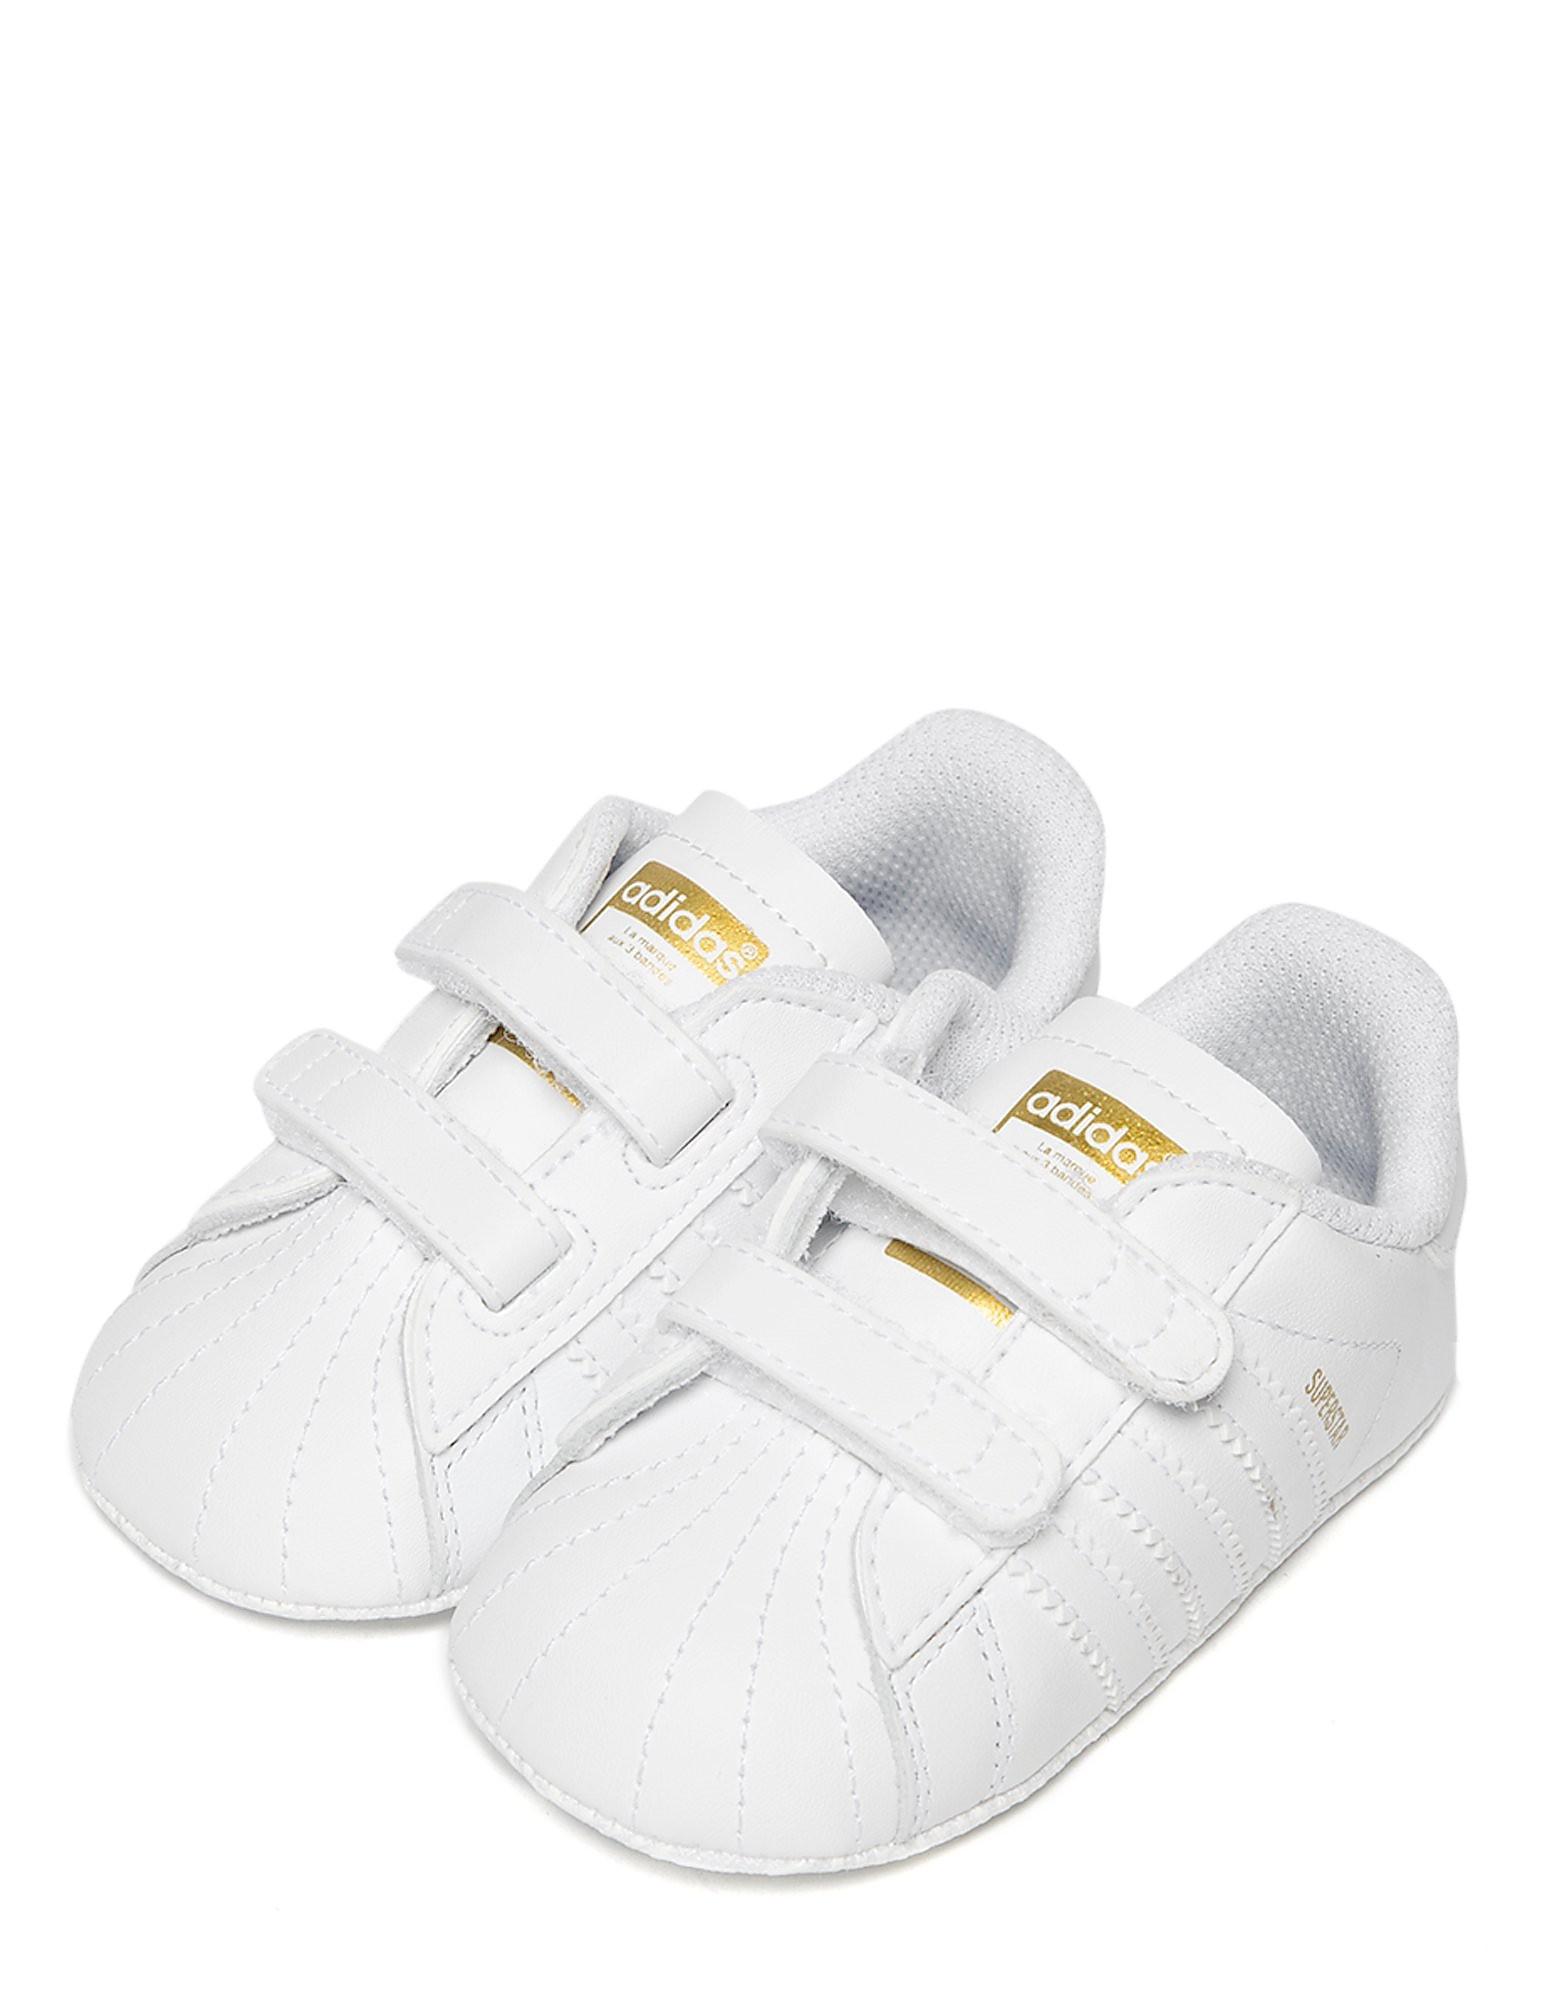 adidas superstar blancas bebe